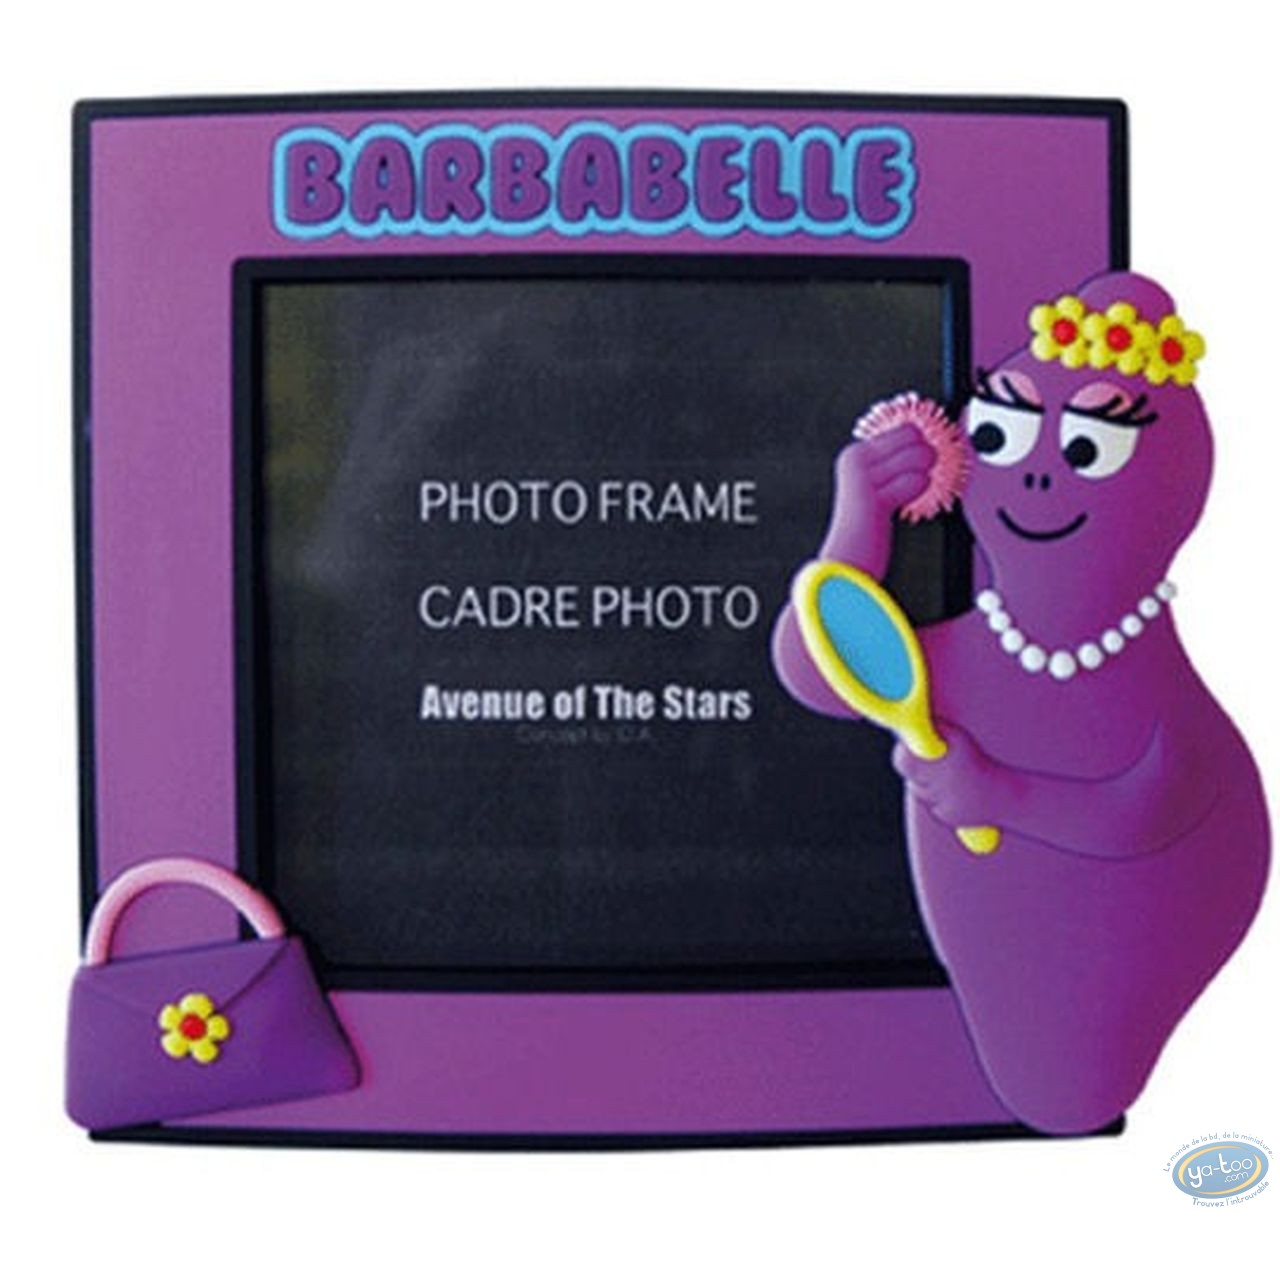 Photo Frame, Barbapapa : Photo frame with Barbapapa